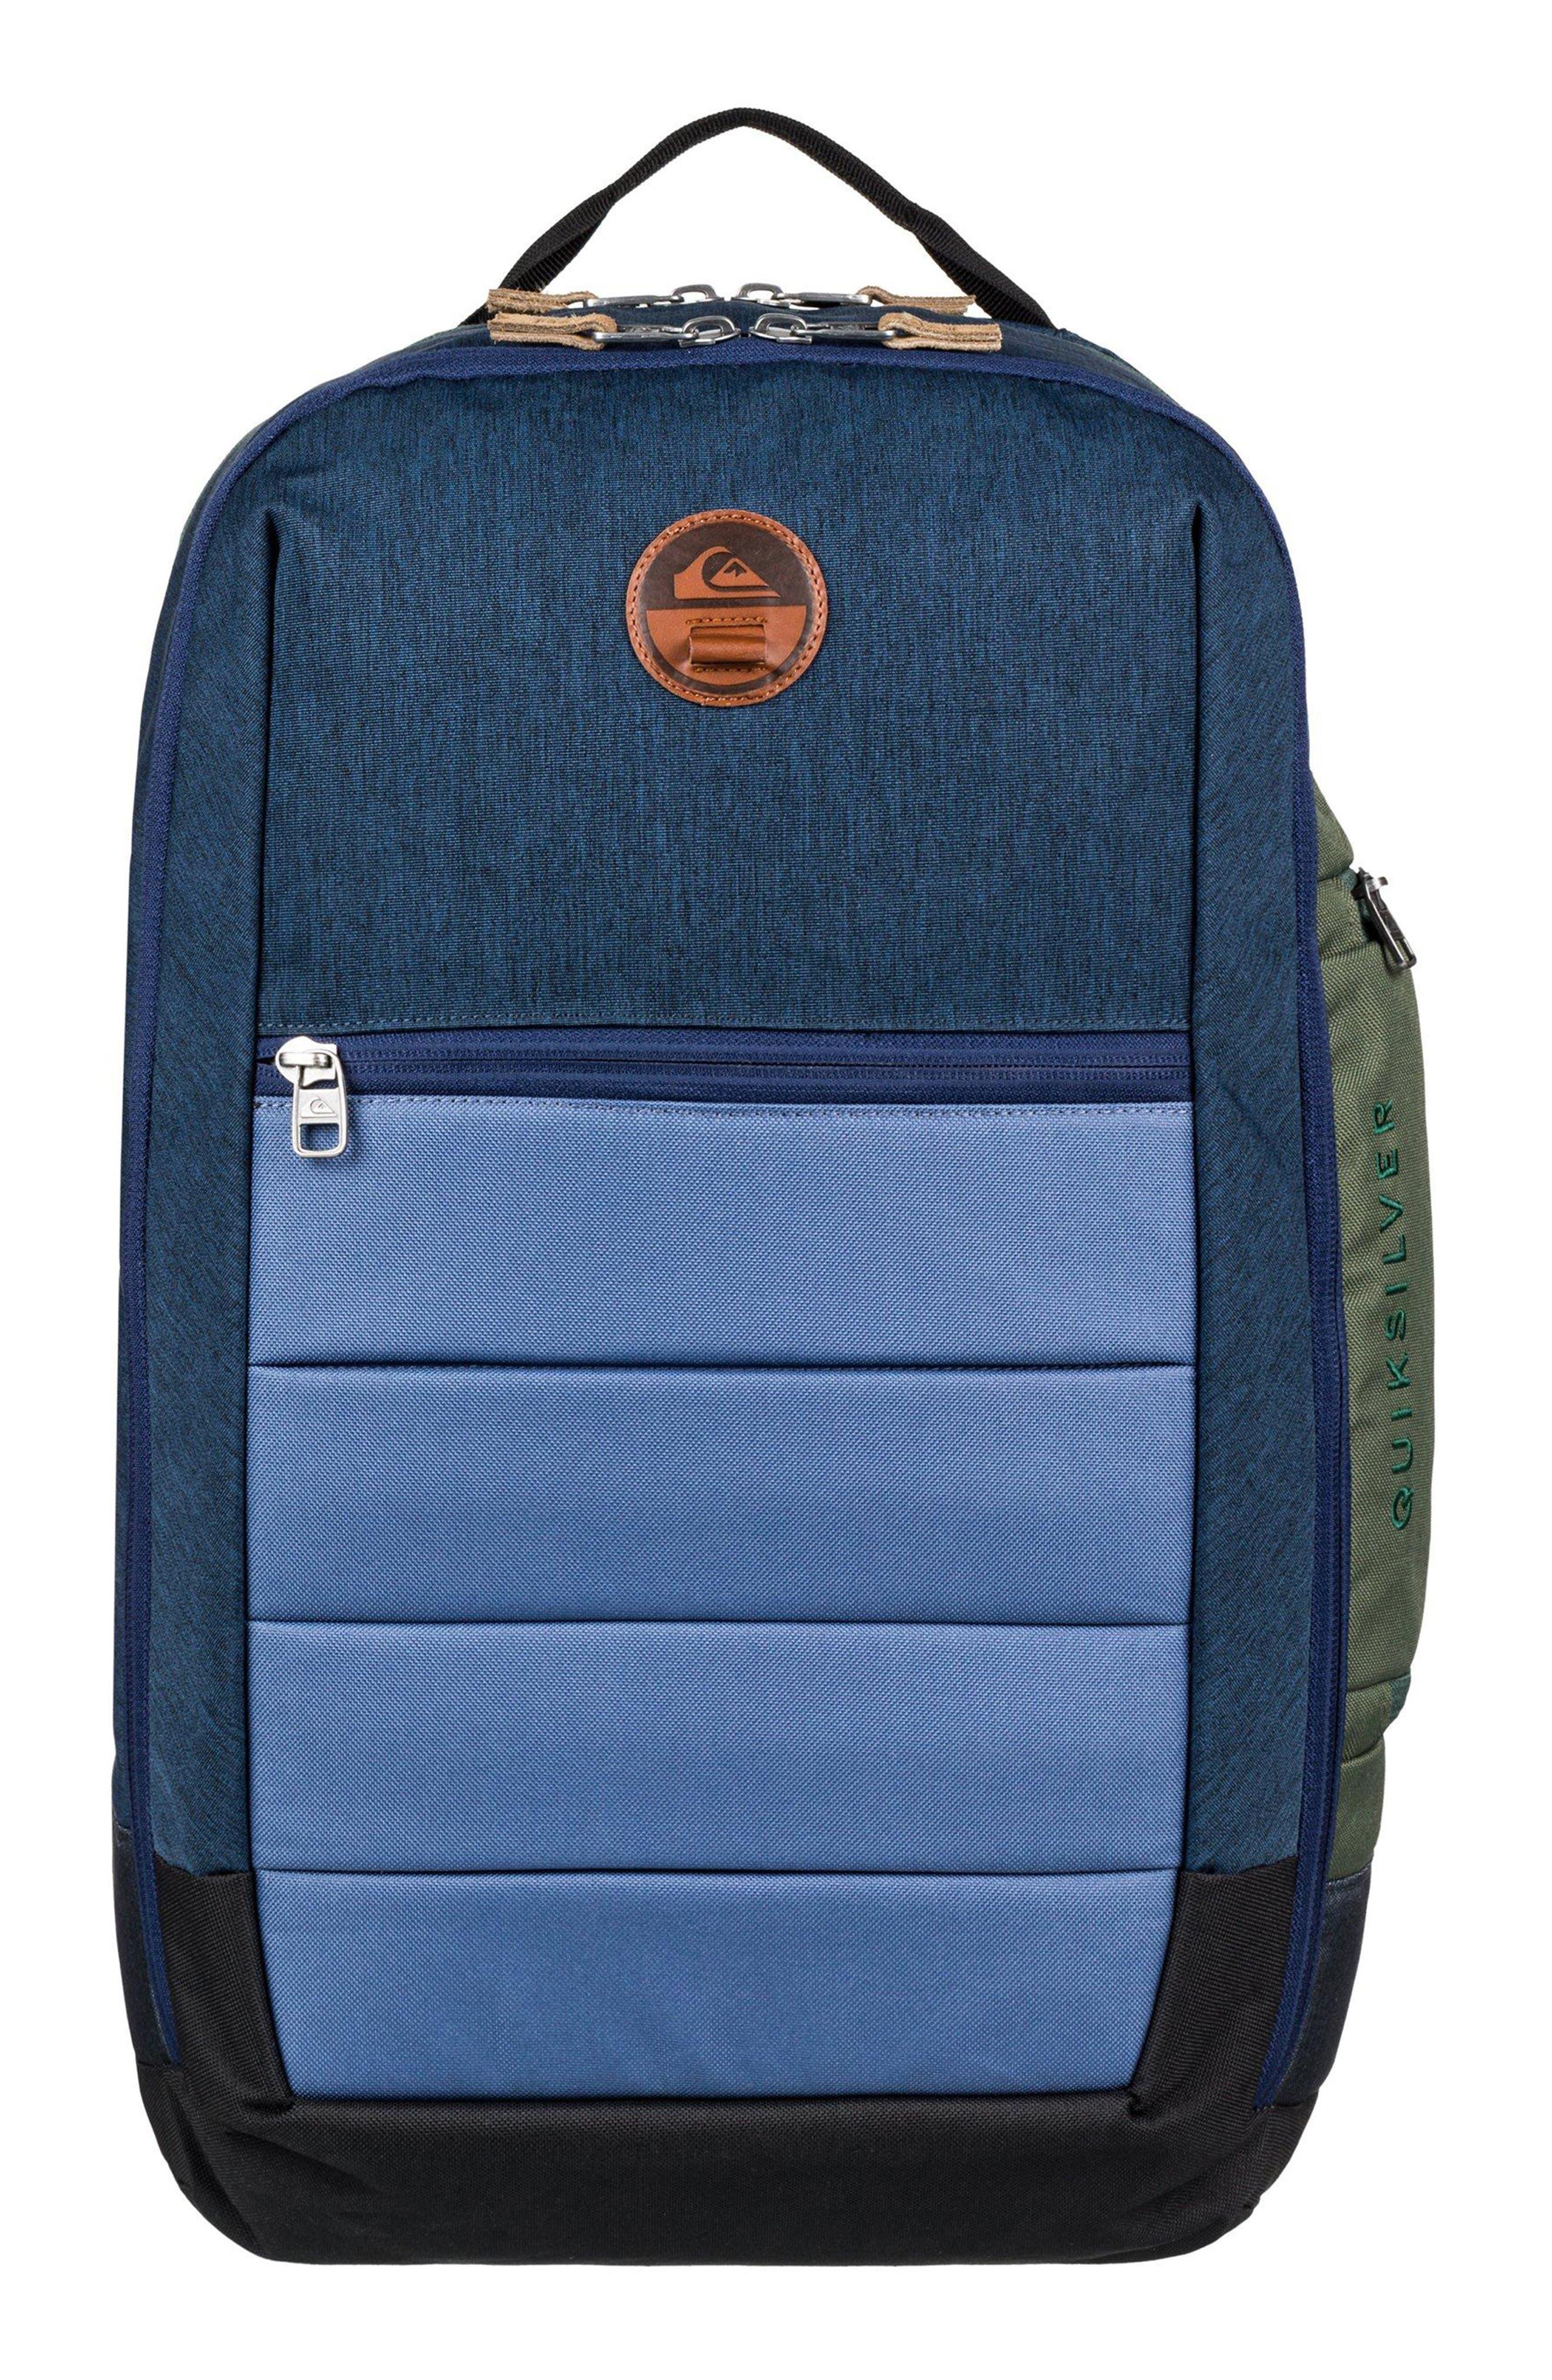 Quiksilver 25L Upshot Plus Backpack - Grey